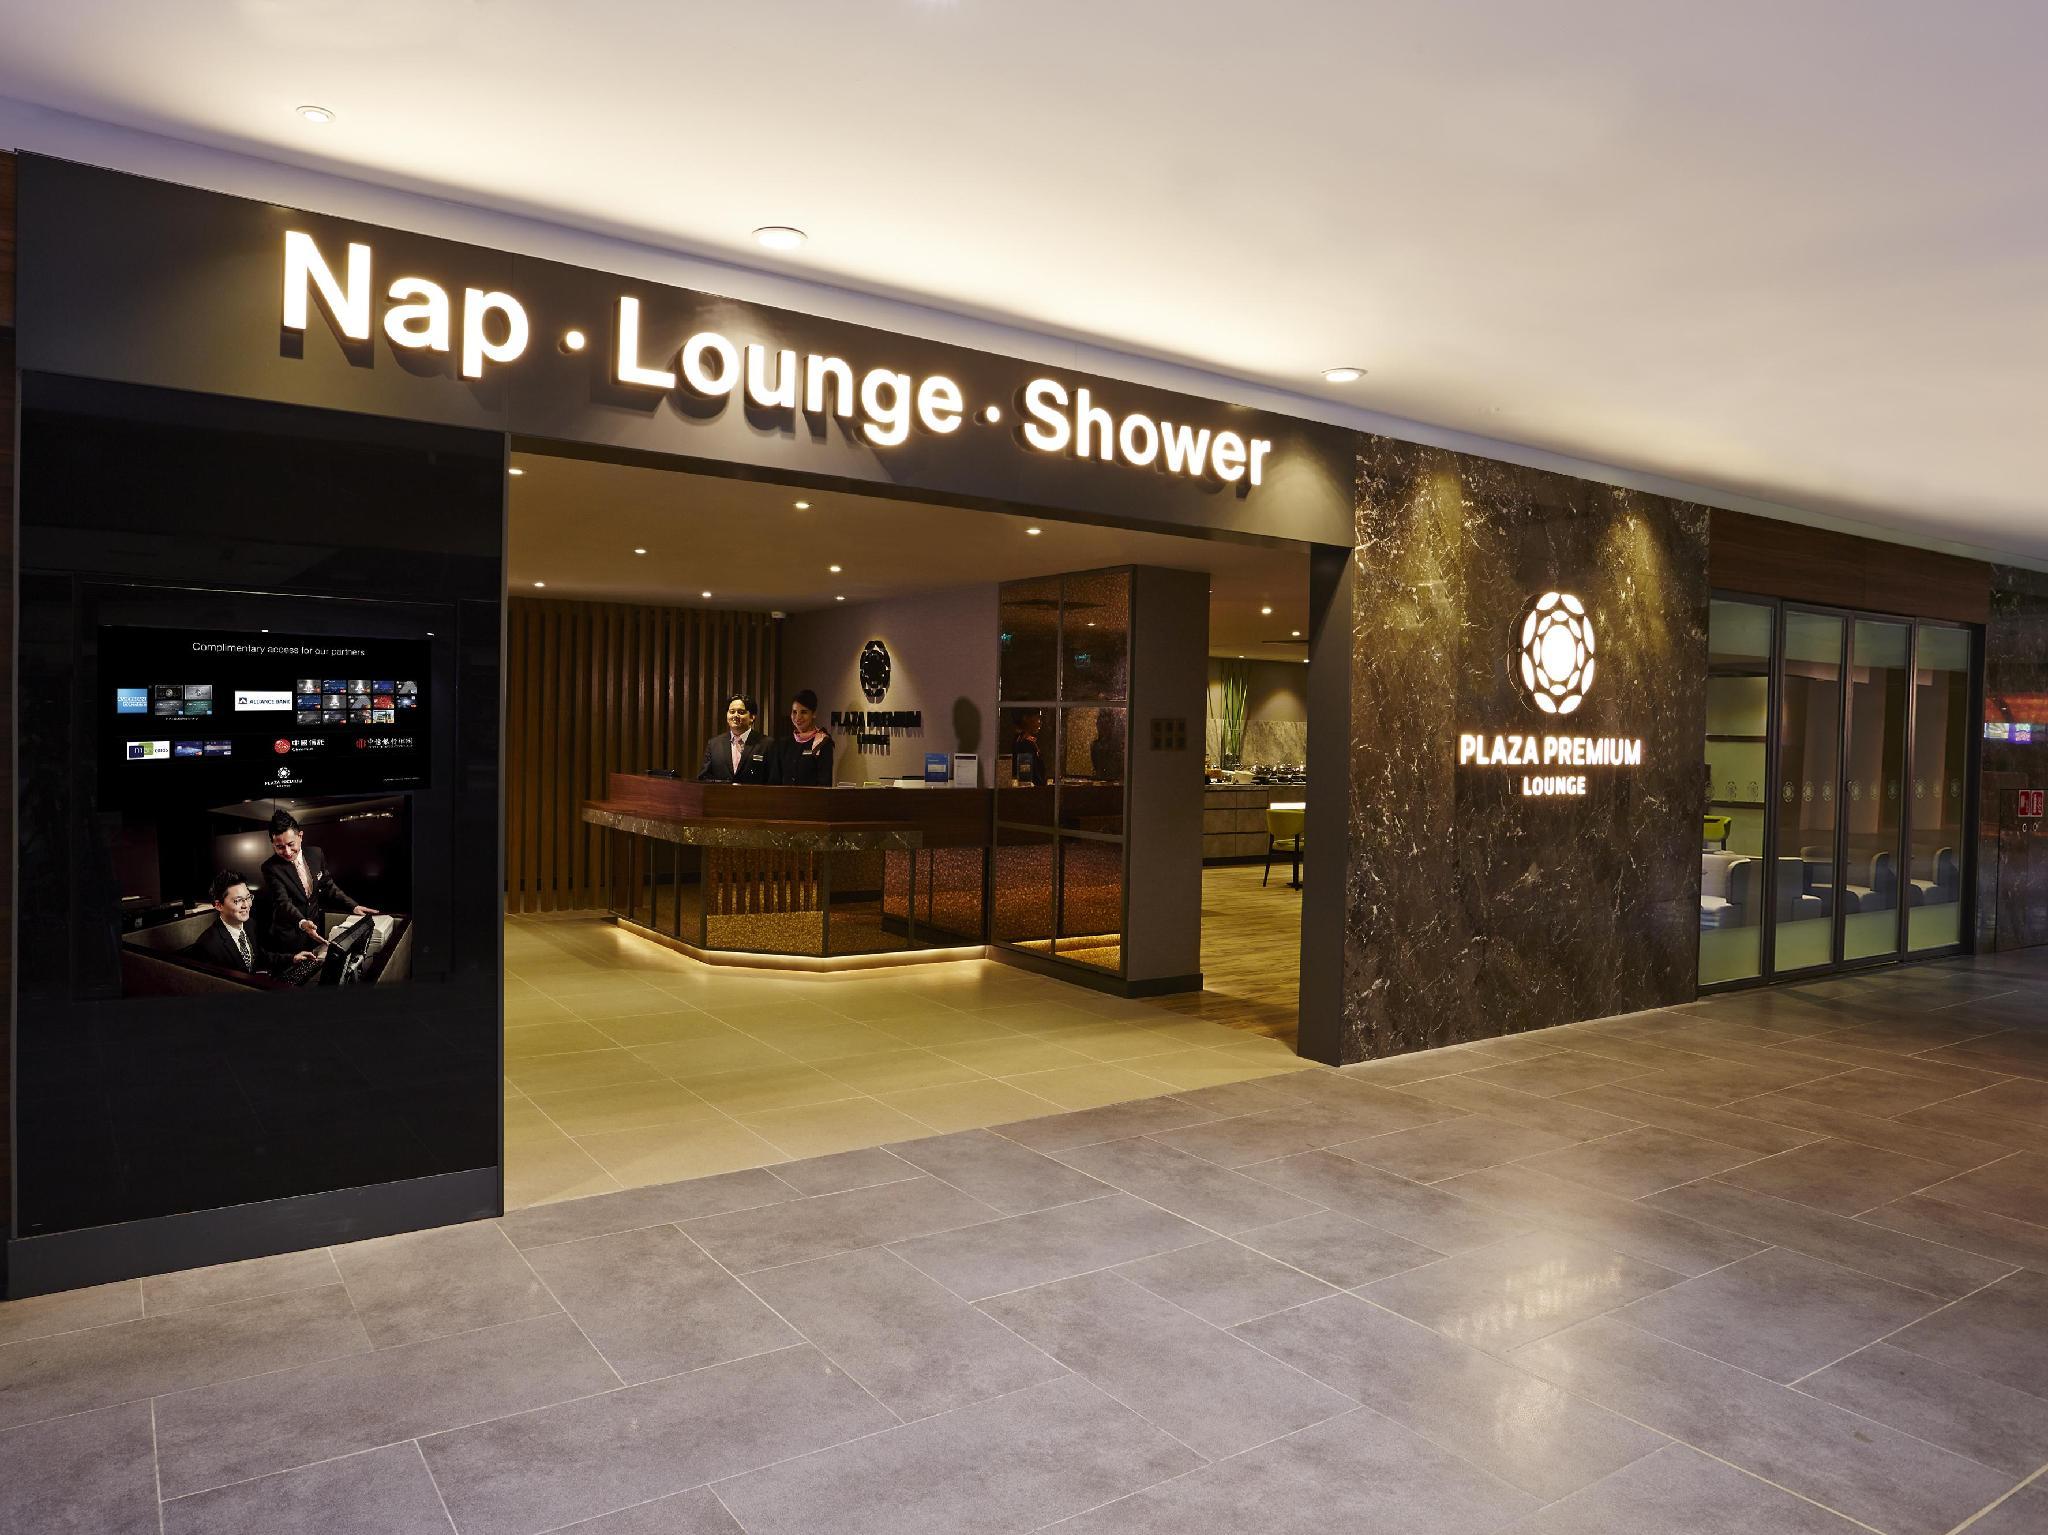 Private Resting Suite, Plaza Premium Lounge - Gateway@klia2, Kuala Lumpur